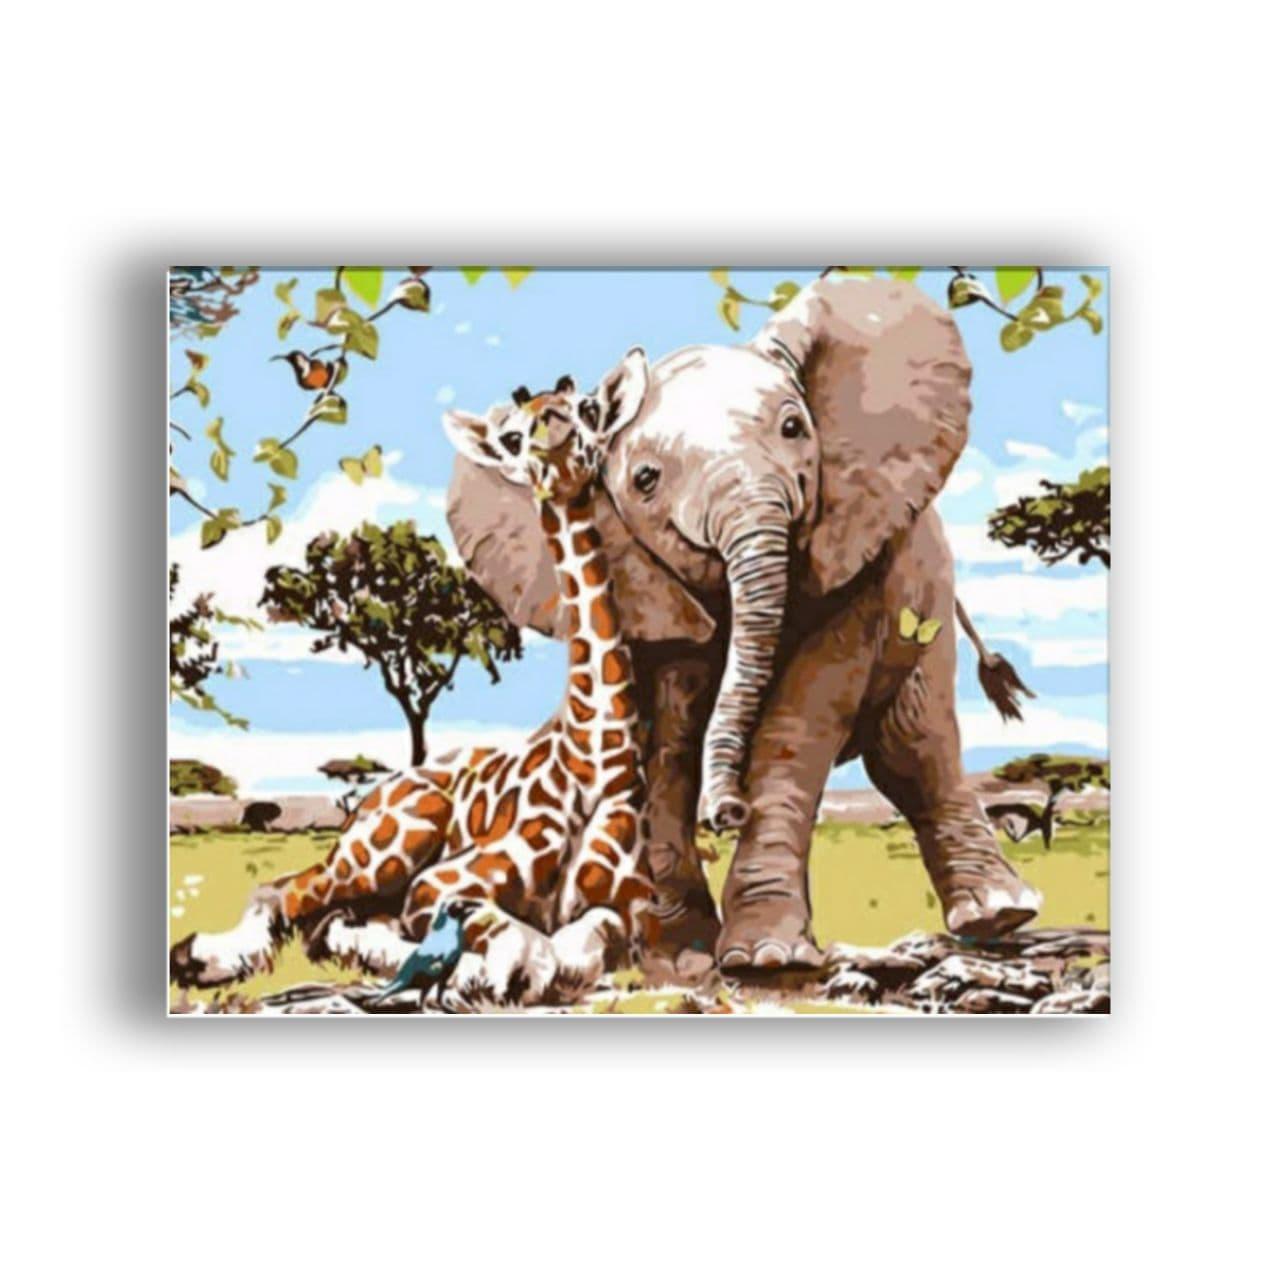 giraffe and elephant1